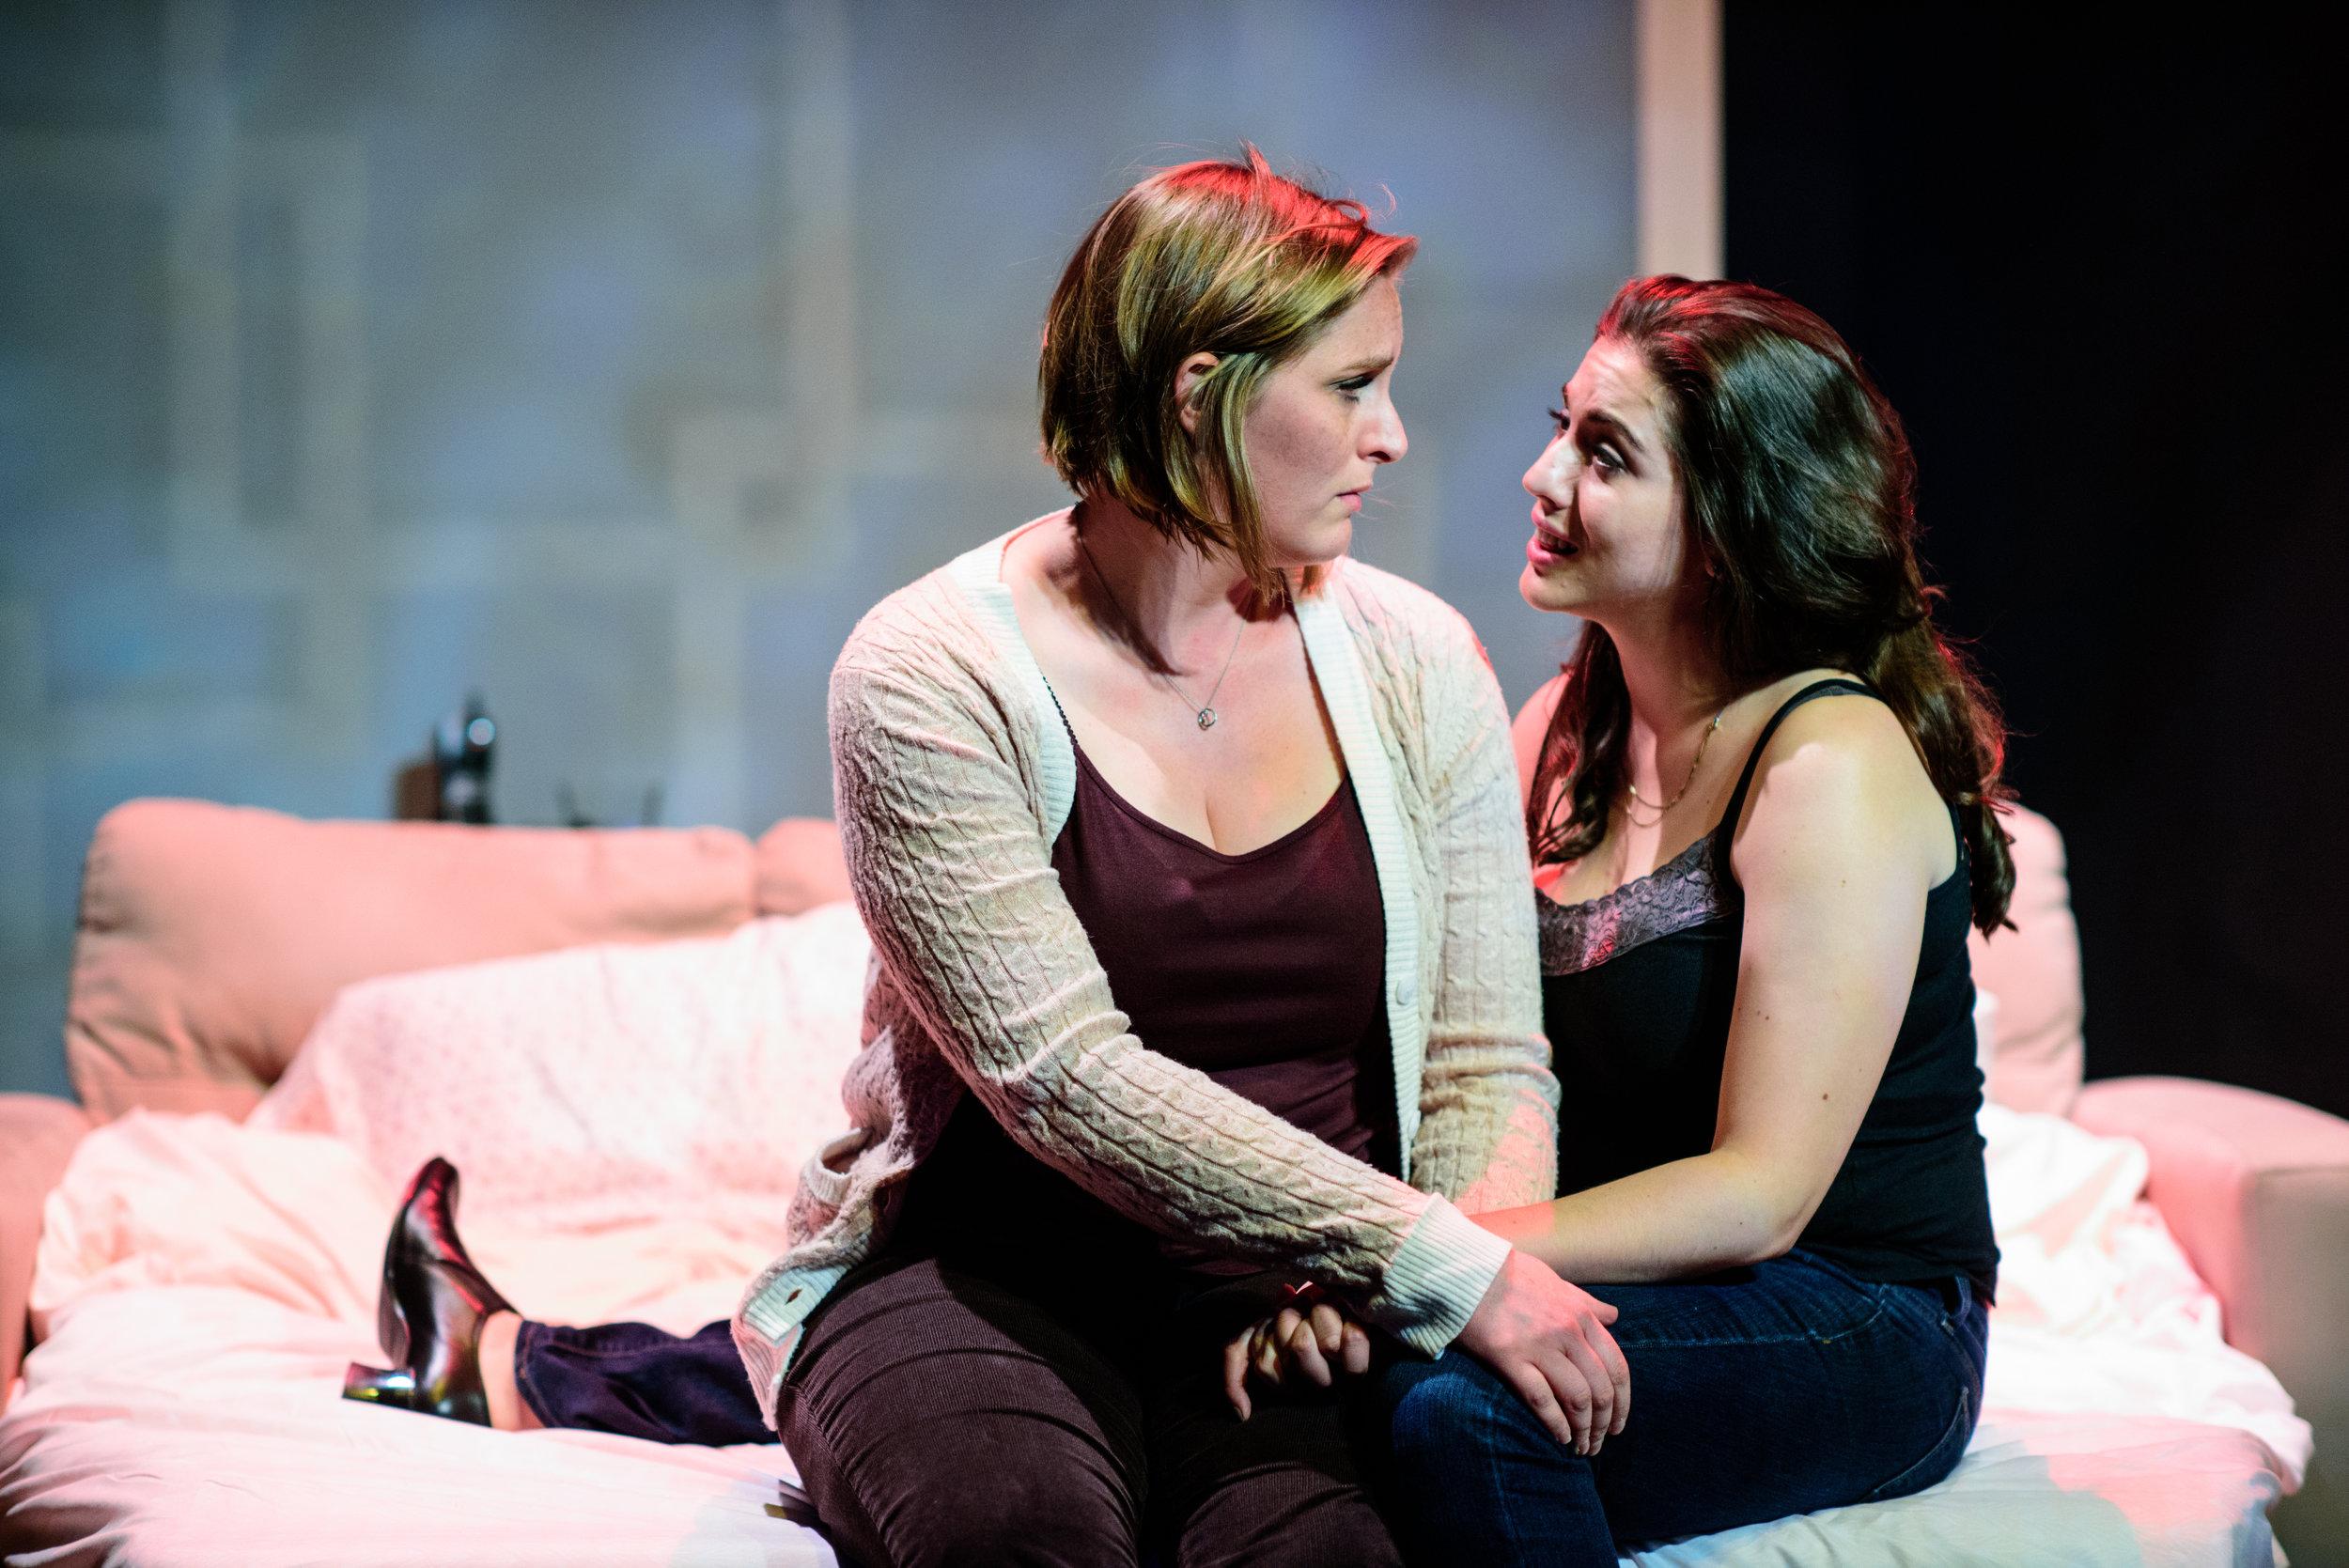 Alison Plott and Rose Sengenberger in  In The Wake . Photo by Paul Goyette.